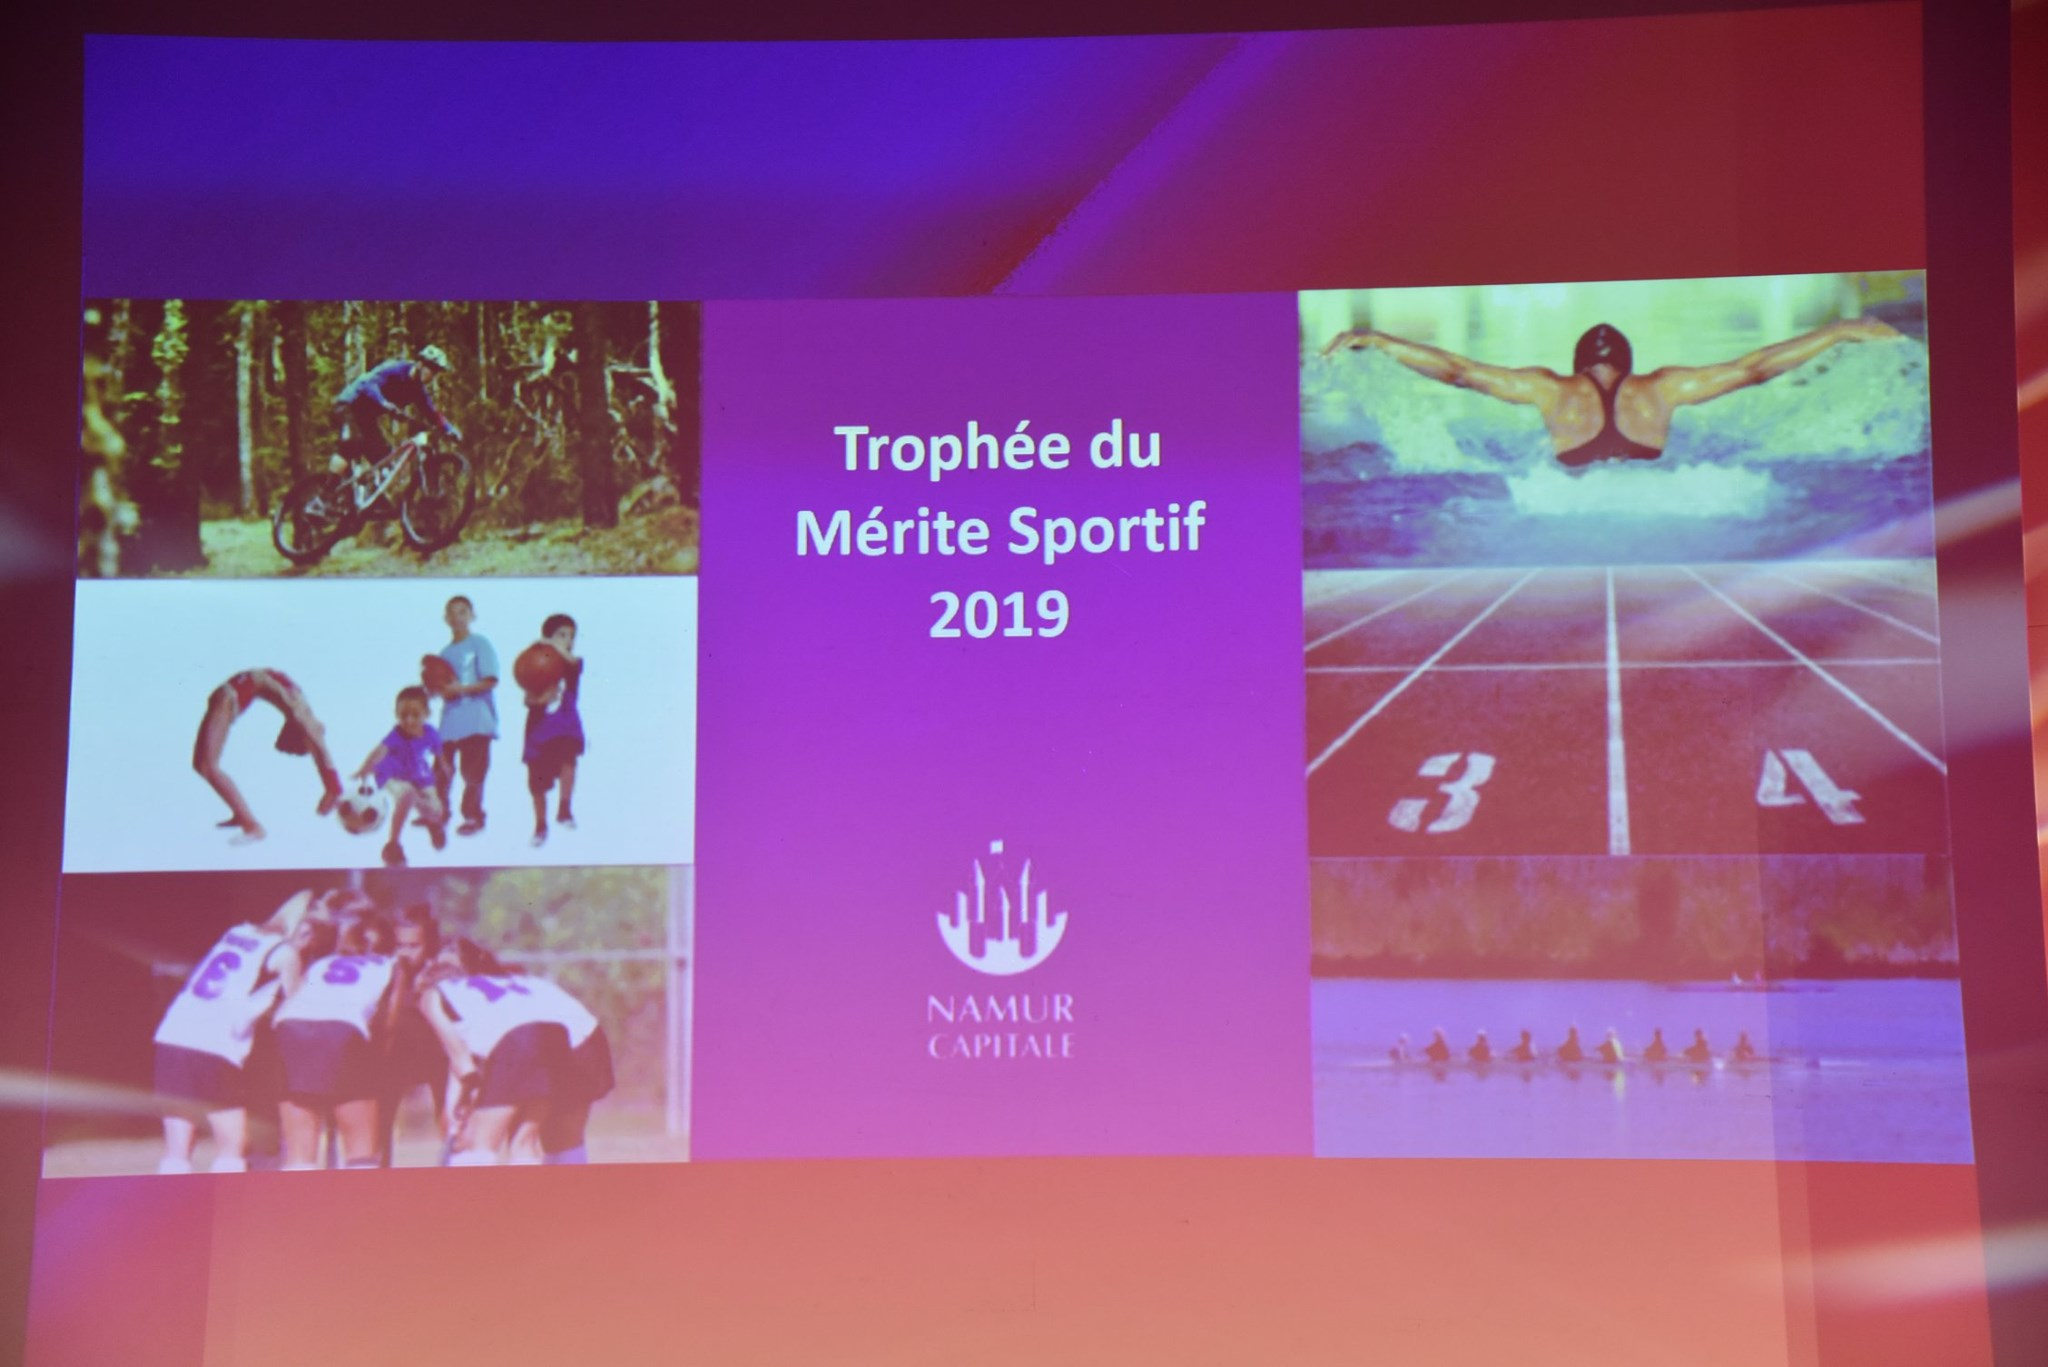 Trophée du mérite sportif 2019